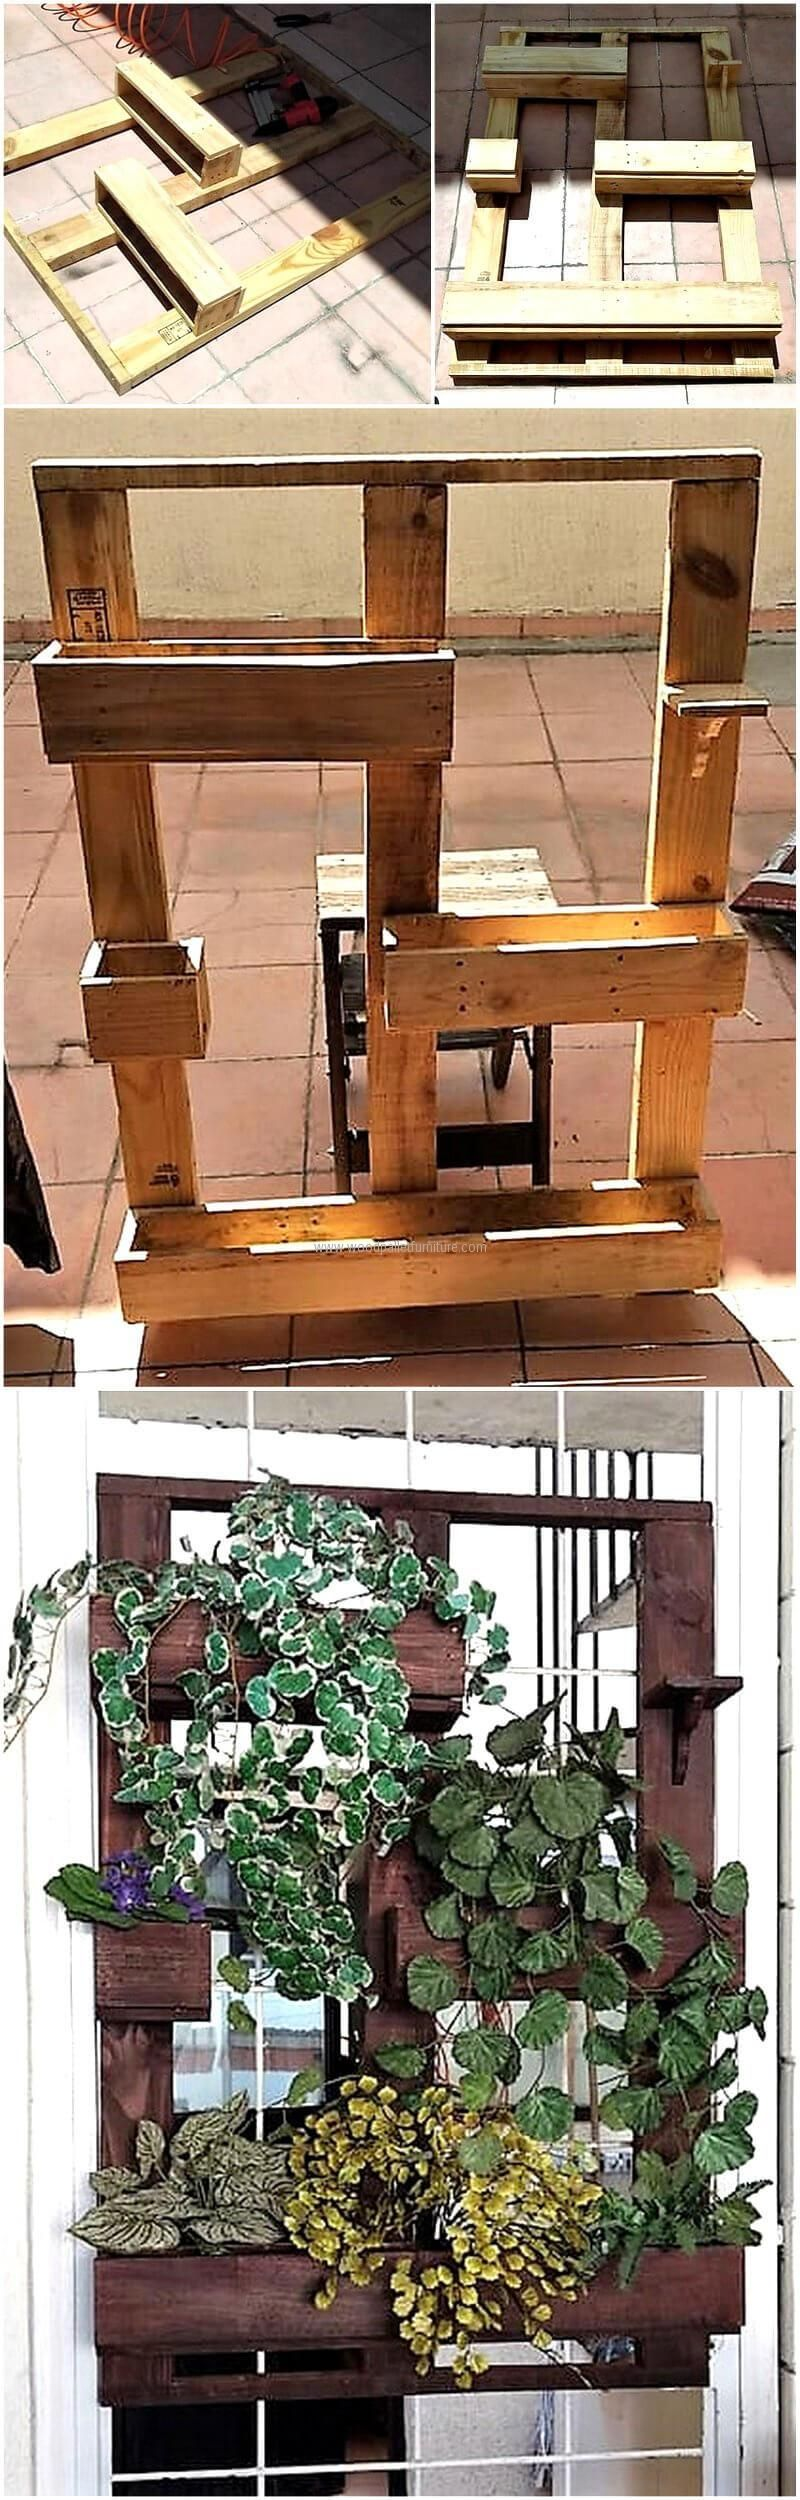 Wooden transport pallets have become increasingly popular for diy - Diy Wooden Pallet Hanging Planter